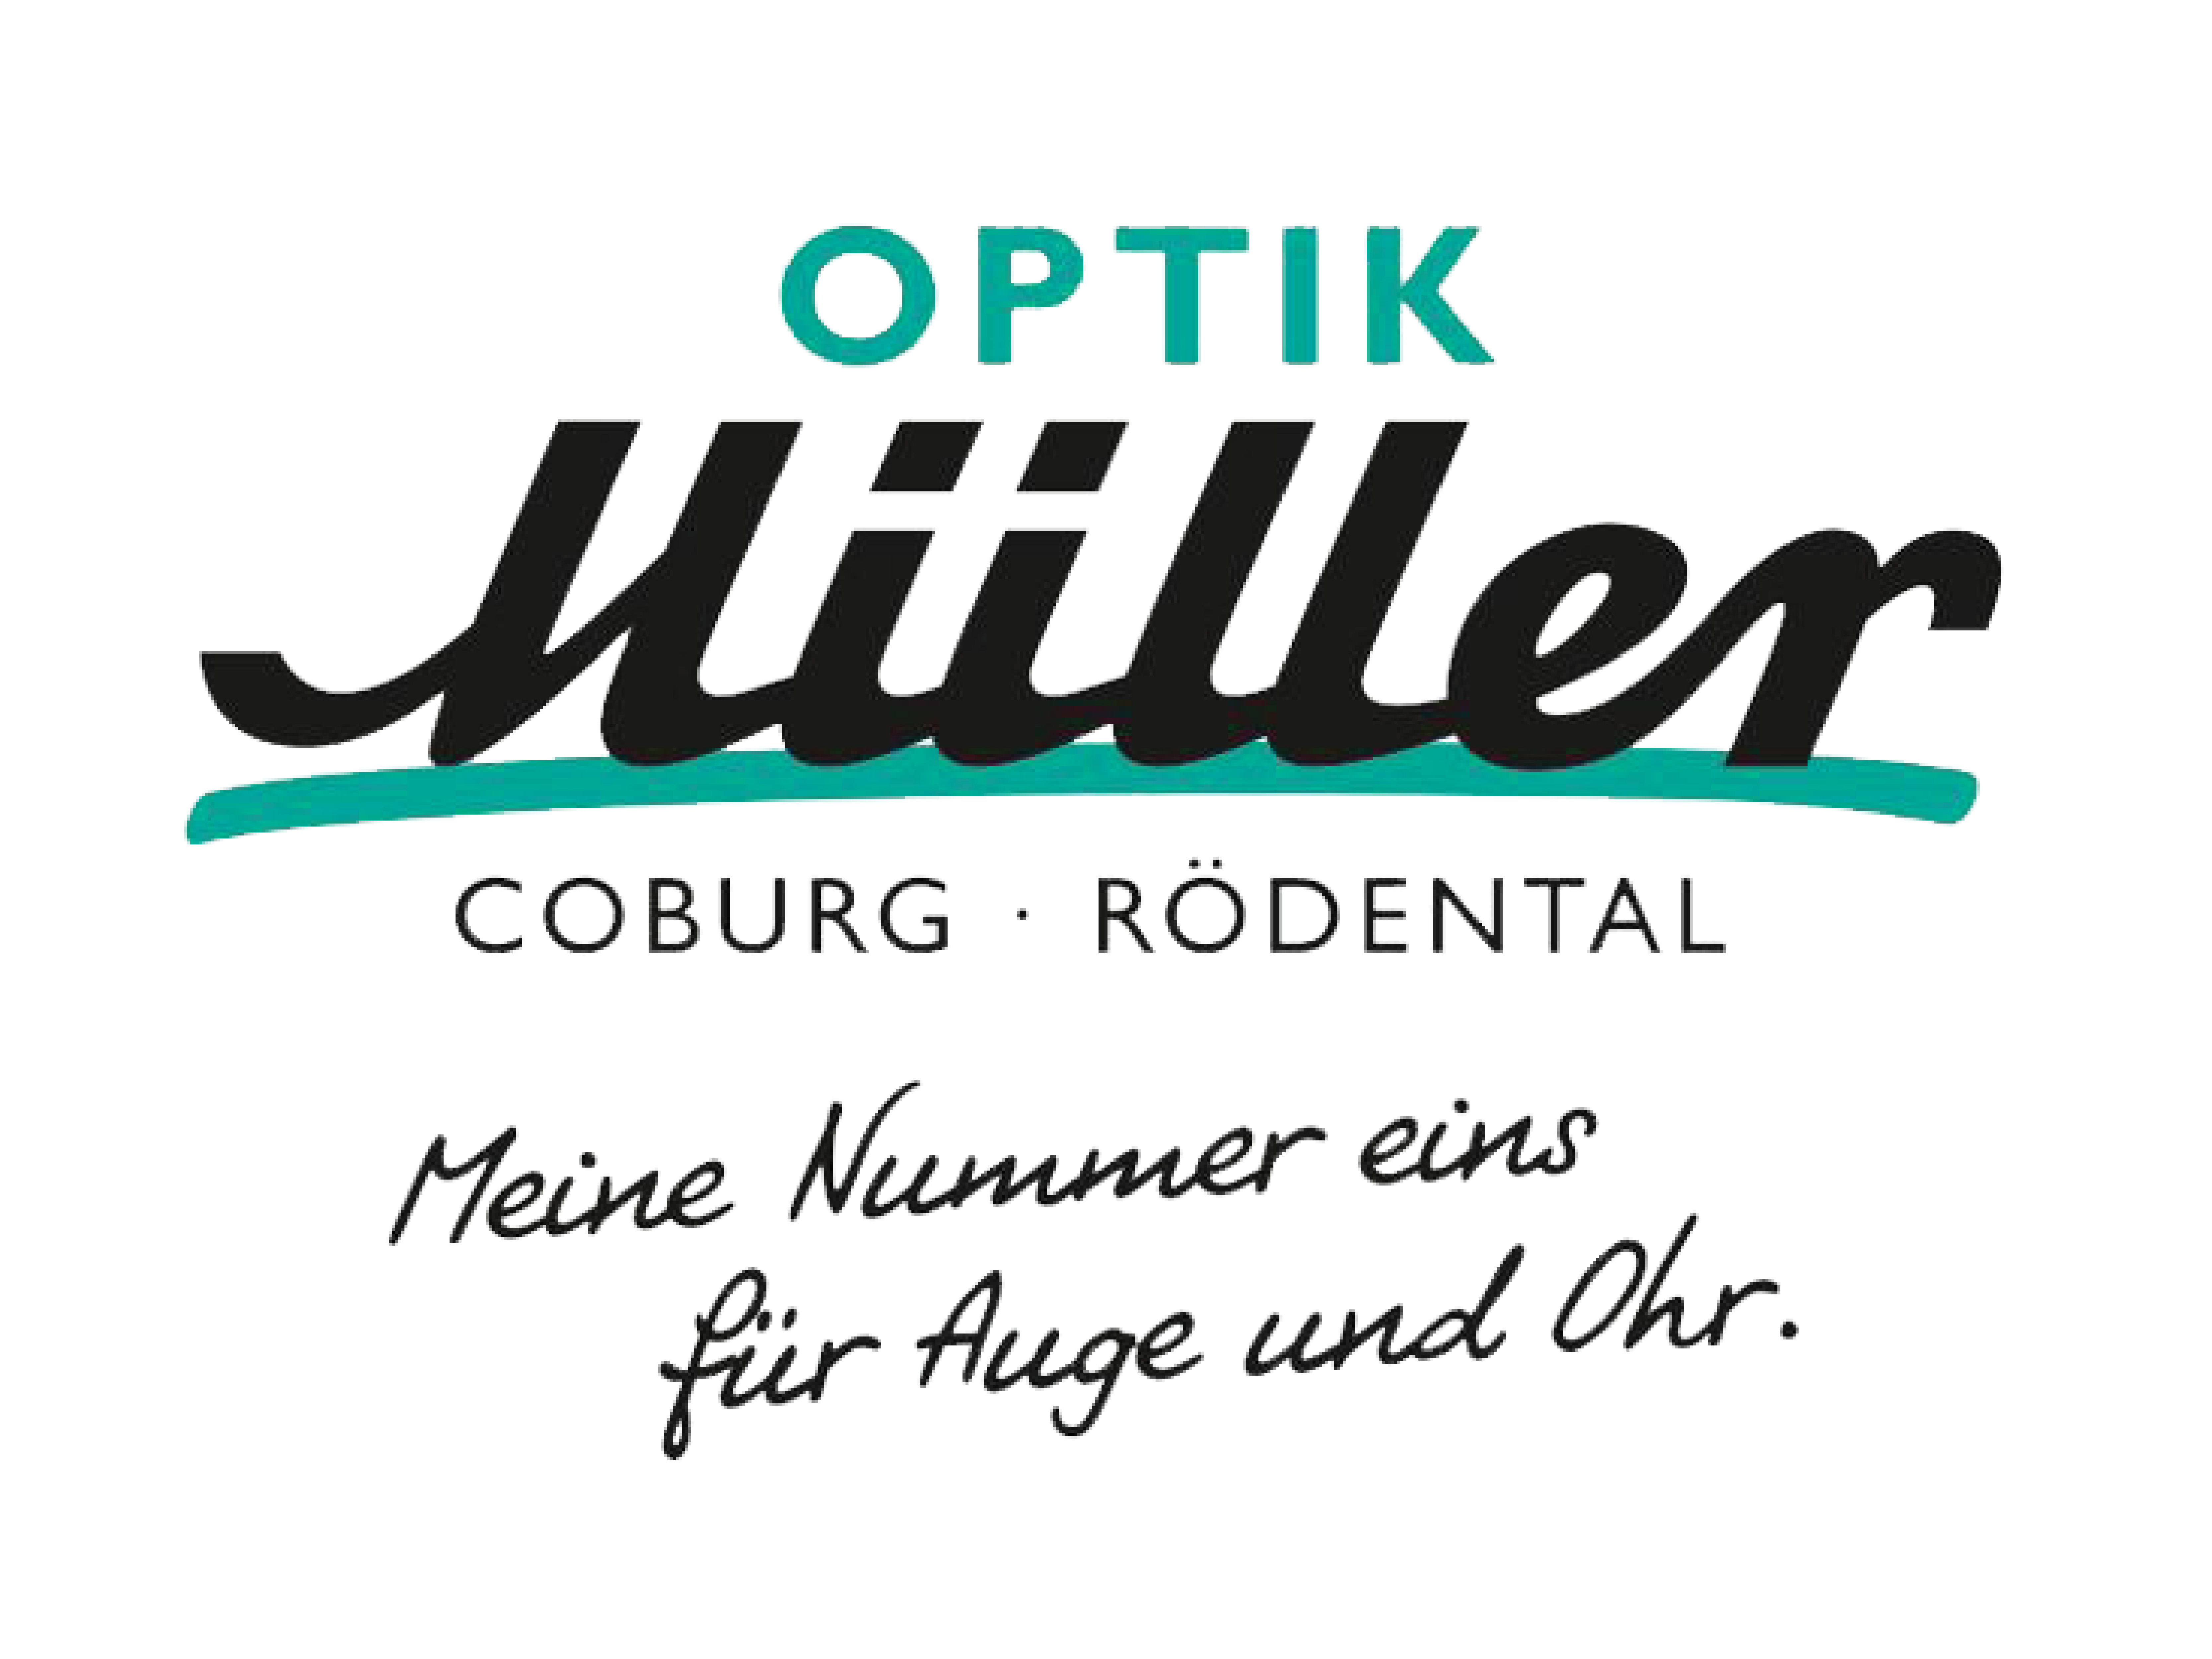 optik-mueller logo